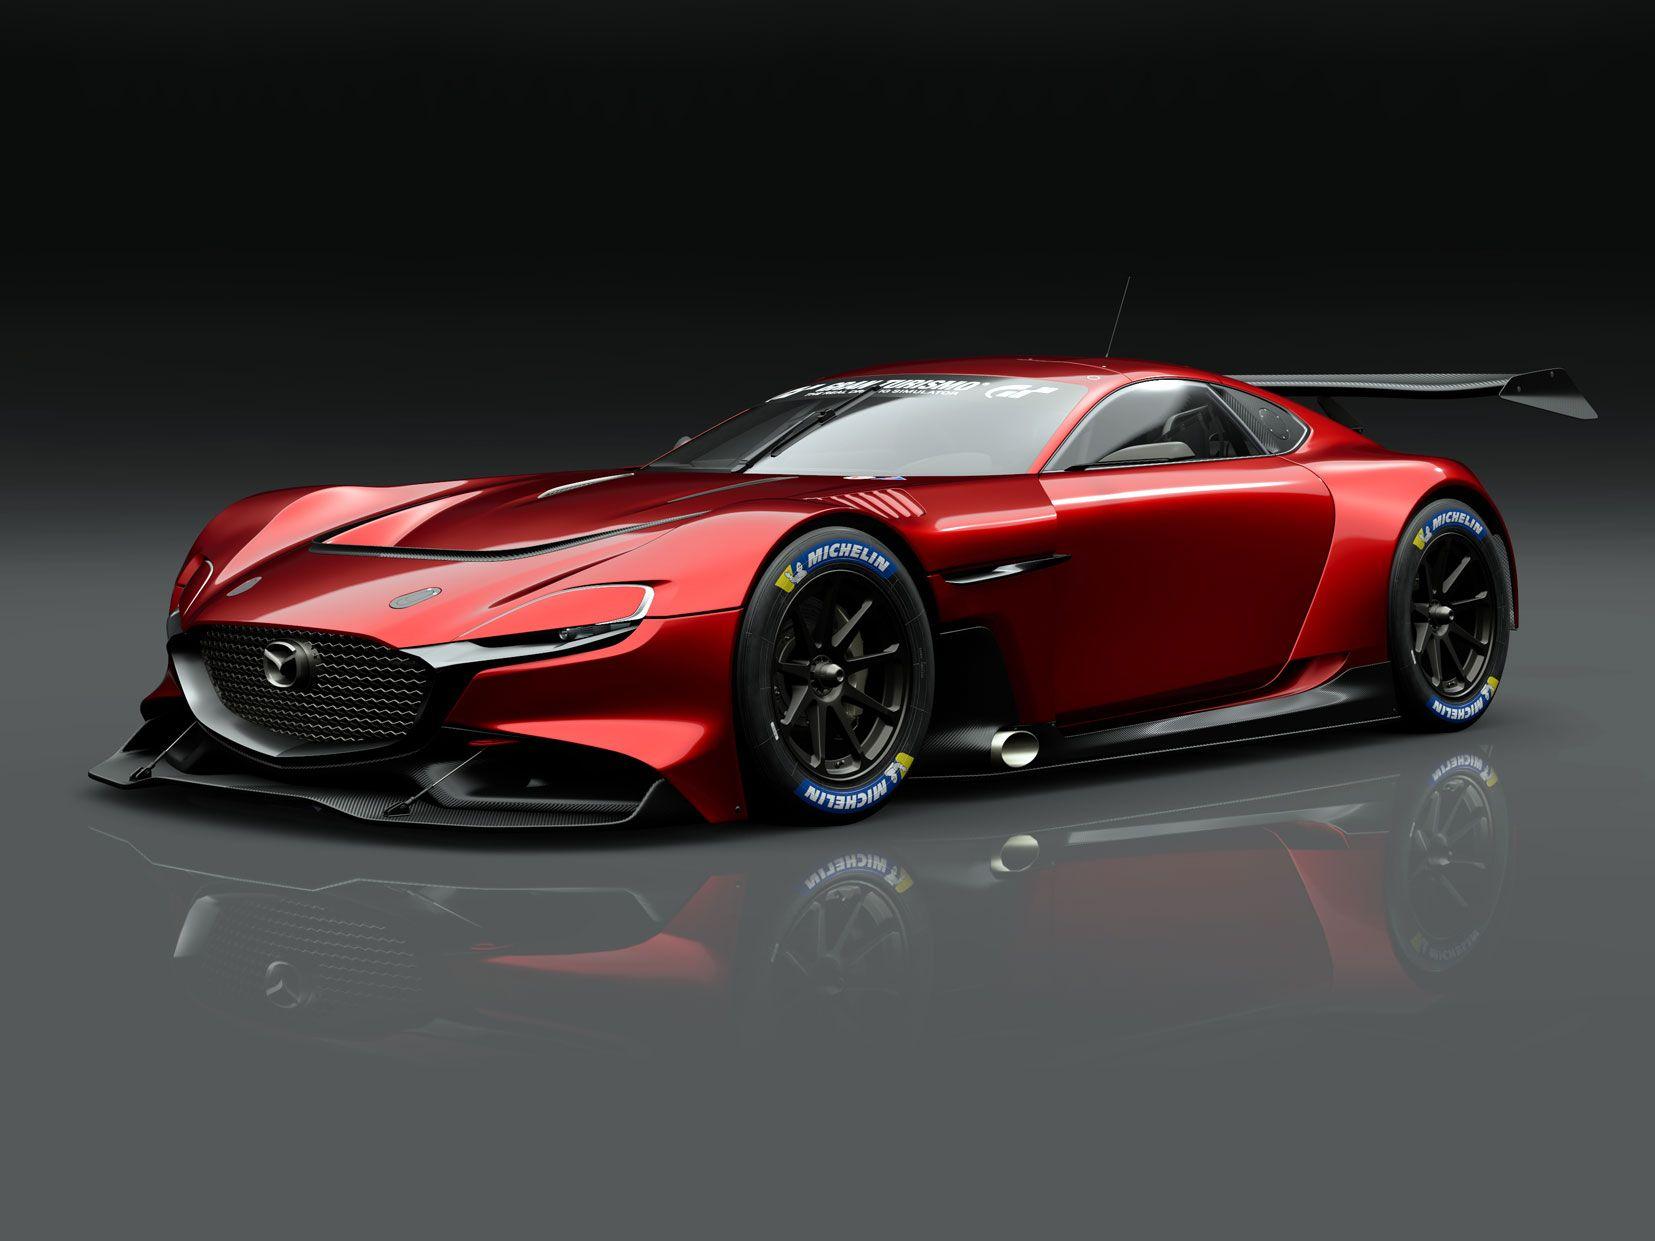 Mazda RX-Vision GT3 Concept  #ConceptCar #GranTurismo #Mazda #conceptcars #cardesign #futuristiccars #design #futuristic #autodesign #automotive #car #cargram #automotivedesign #autodesign #cardesignworld #cardesignercommunity #cardesignpro #carbodydesign #cardesigner #vehicledesign